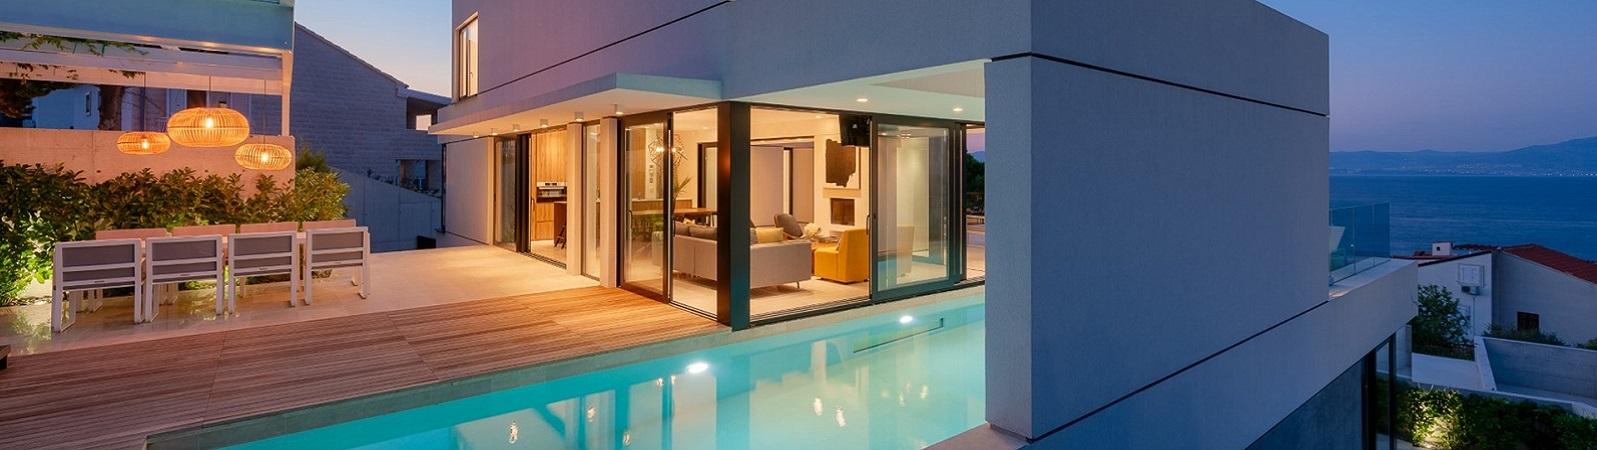 Villa in Sutivan - Split